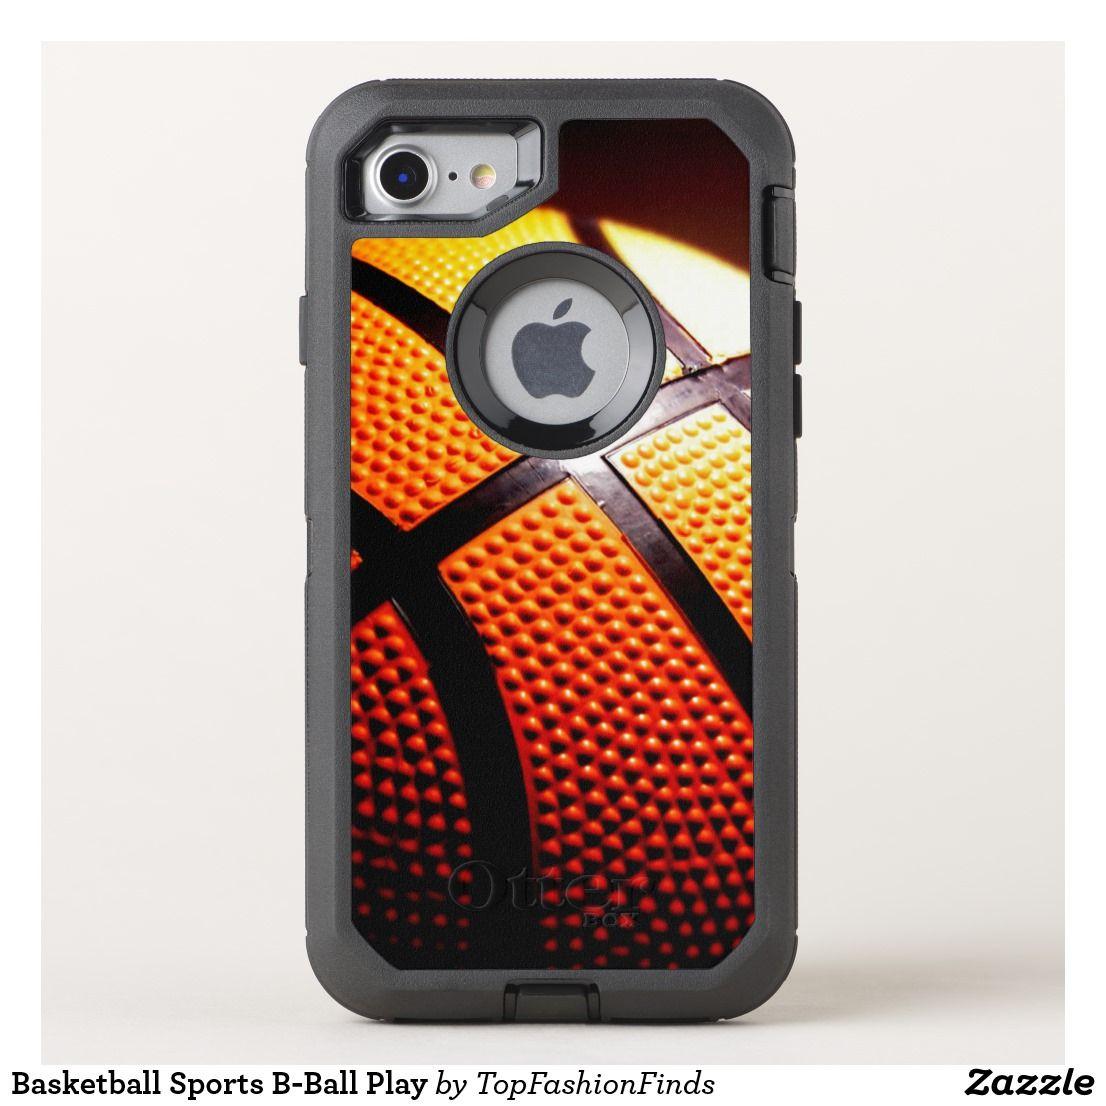 reputable site b11bd 78bac Basketball Sports B-Ball Play OtterBox iPhone Case | Zazzle.com ...